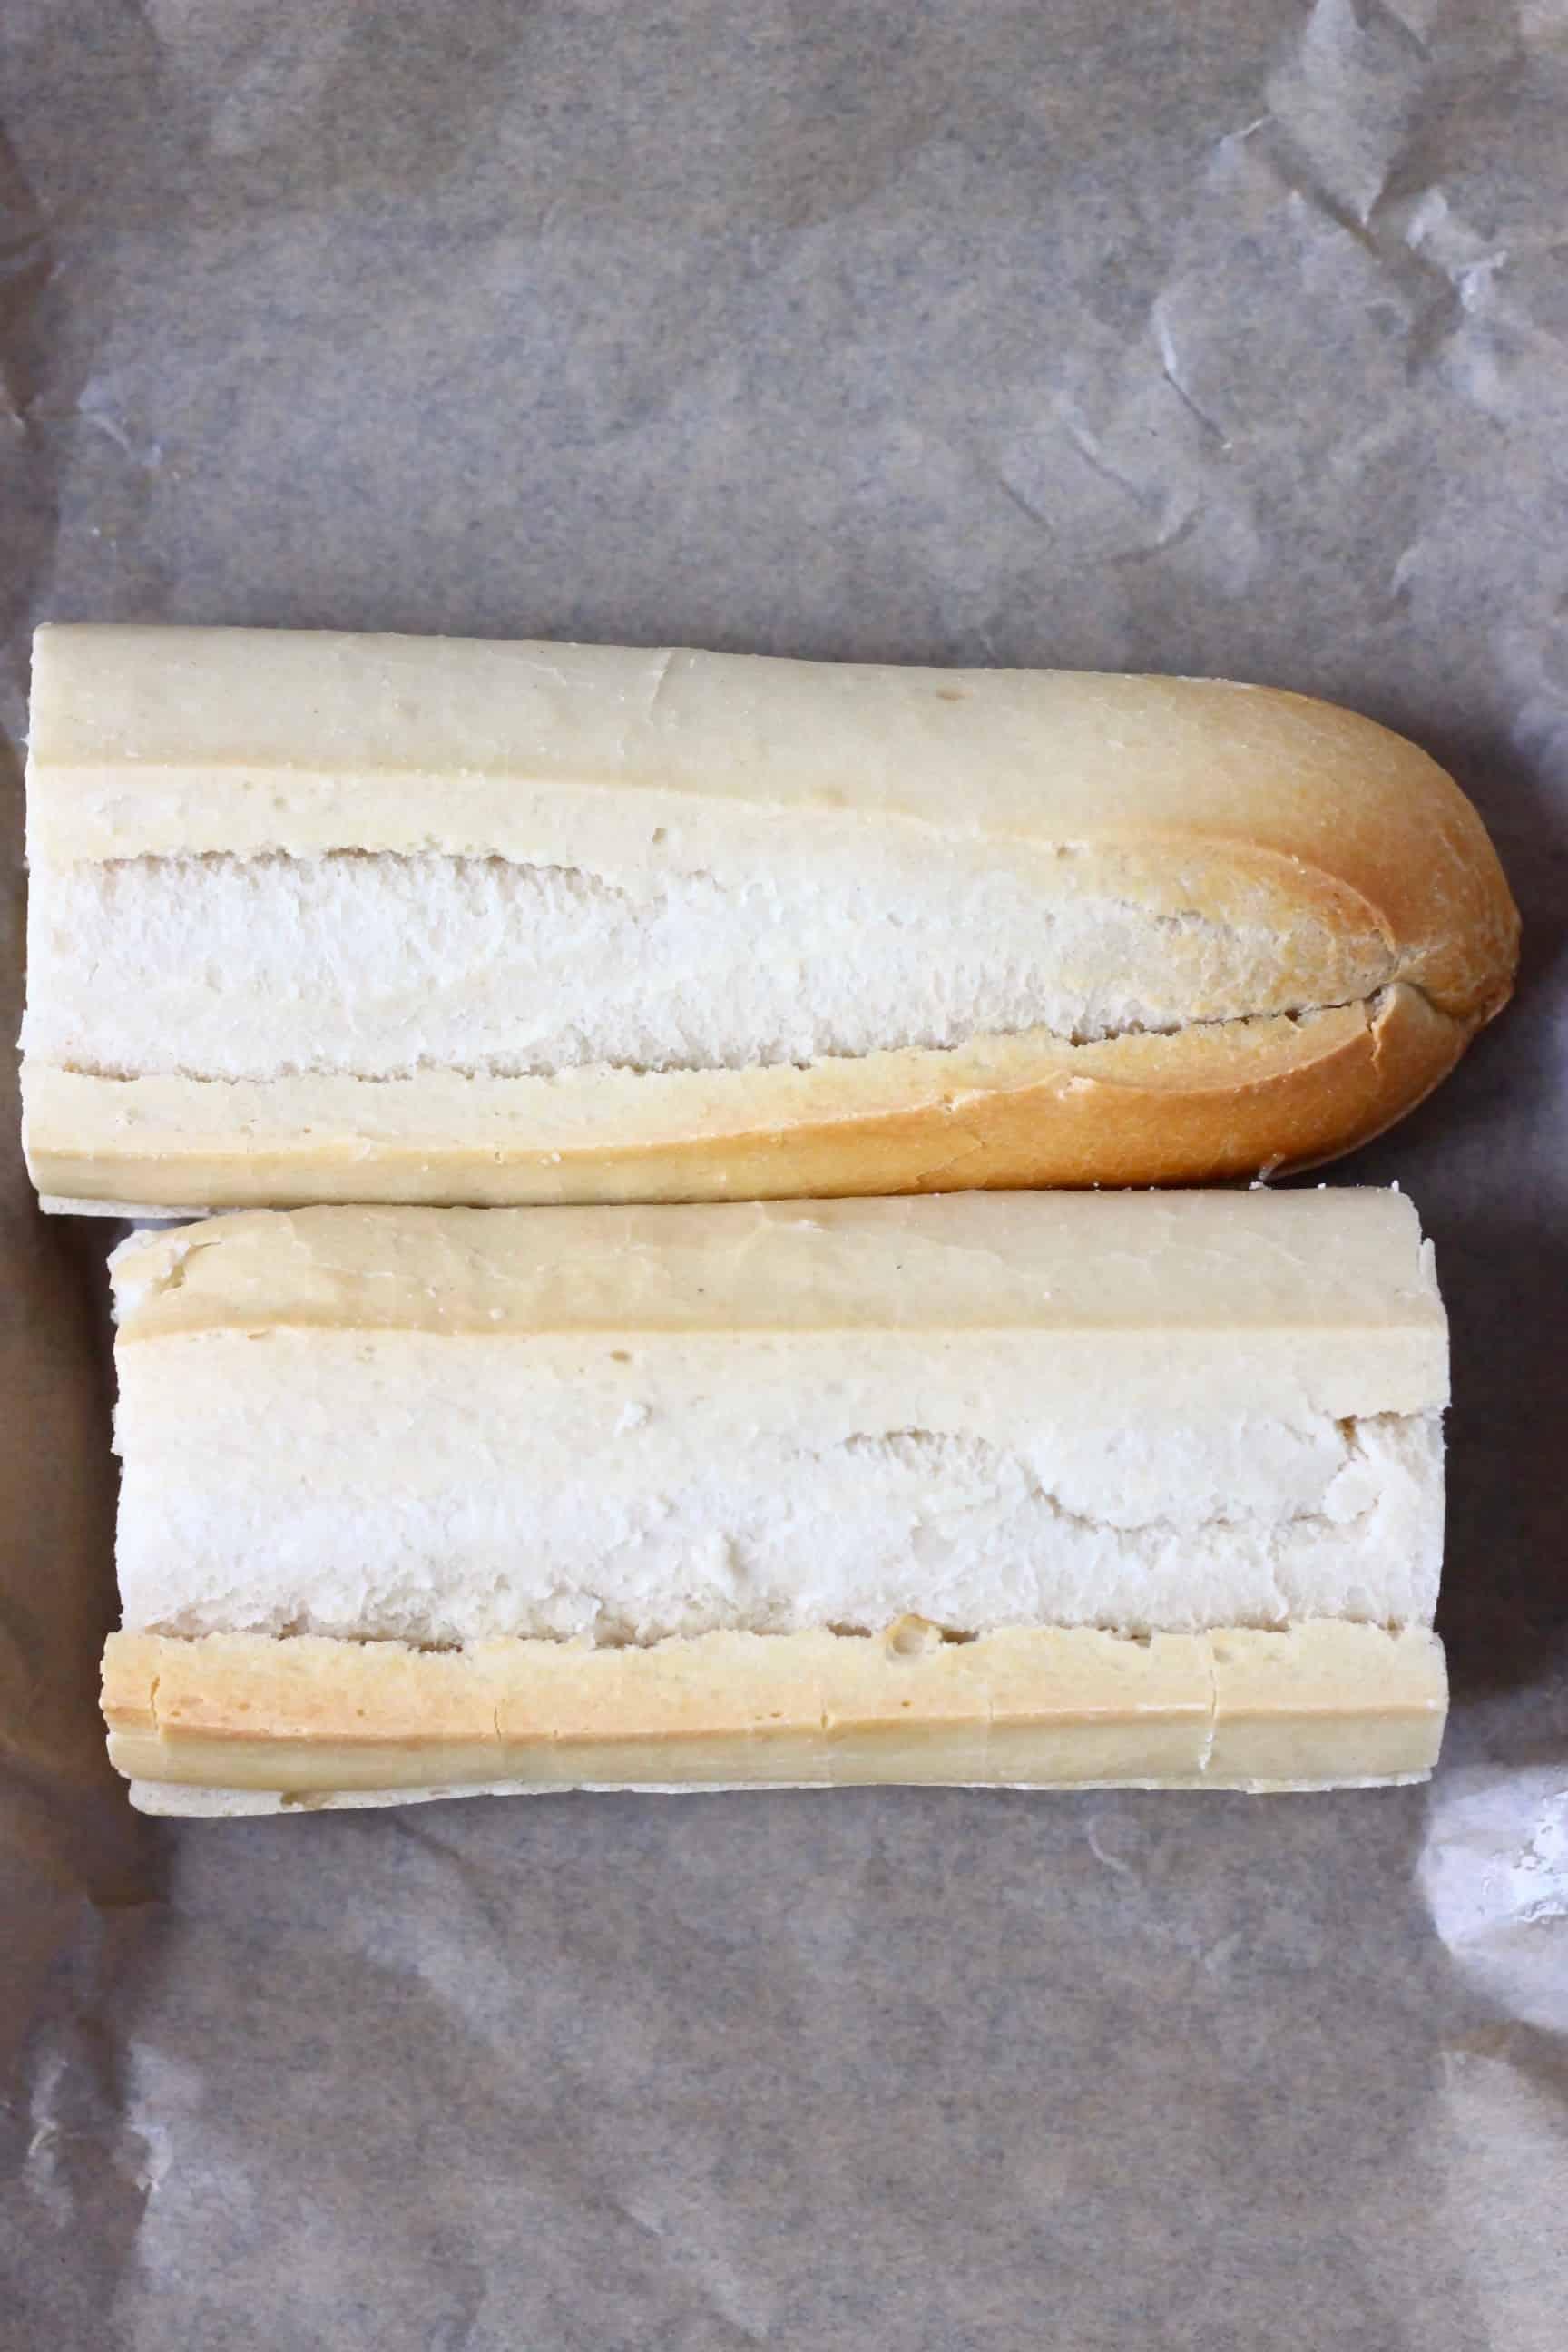 Twi white baguette halves on a sheet of baking paper